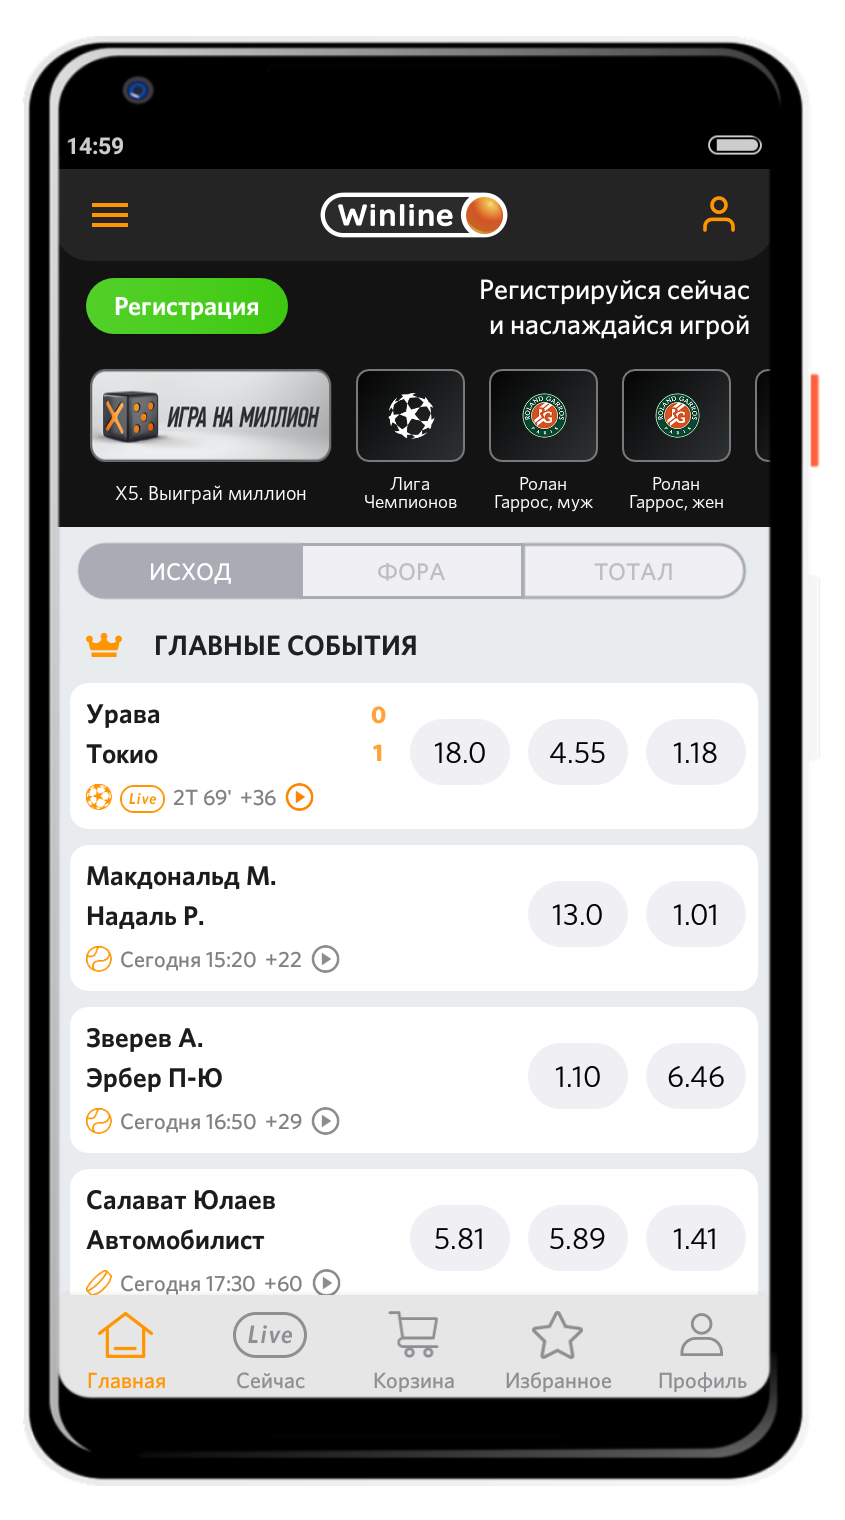 андроид приложение Винлайн